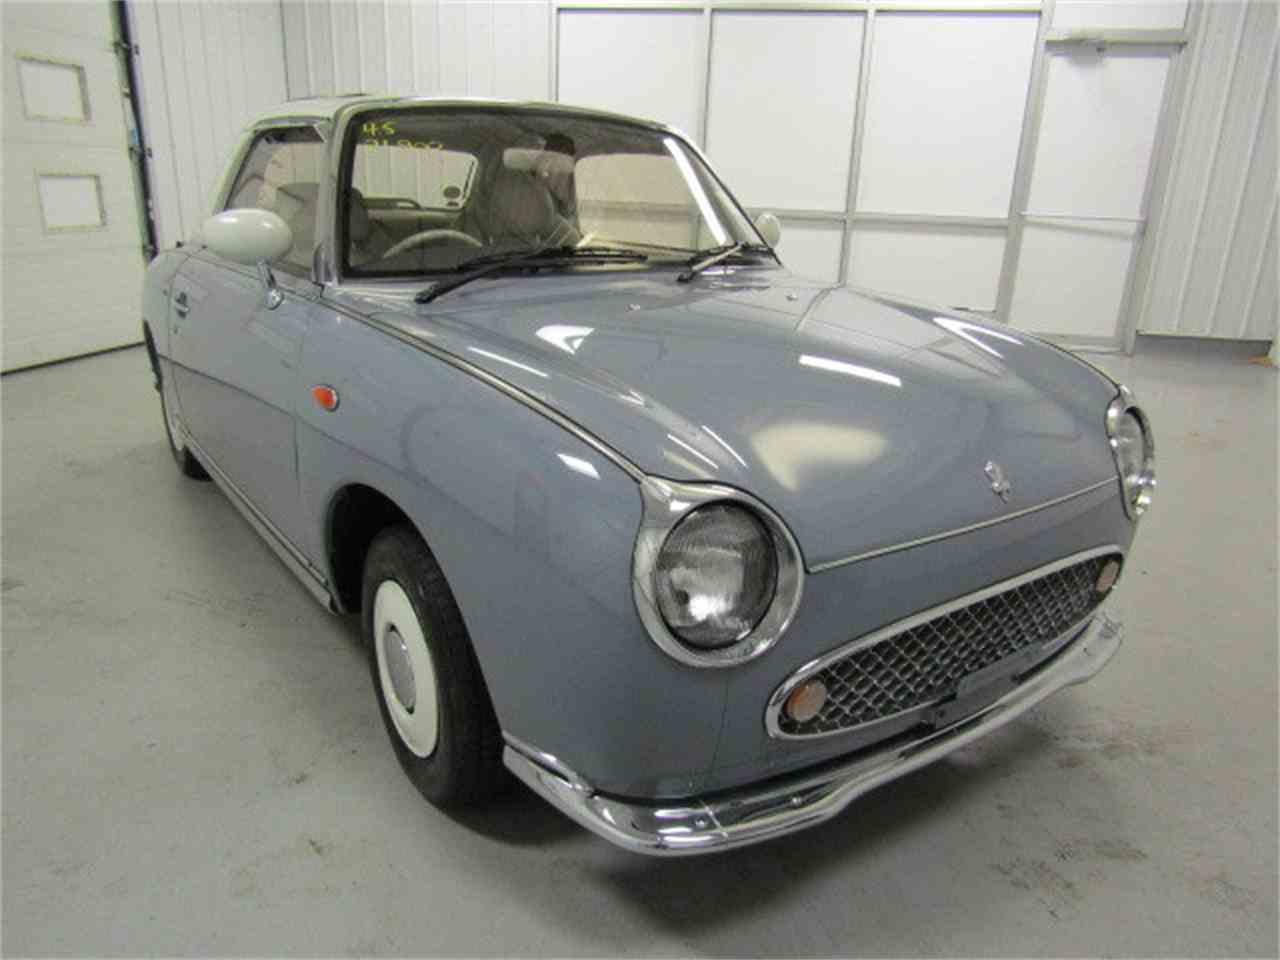 1991 Nissan Figaro for Sale | ClassicCars.com | CC-1040620